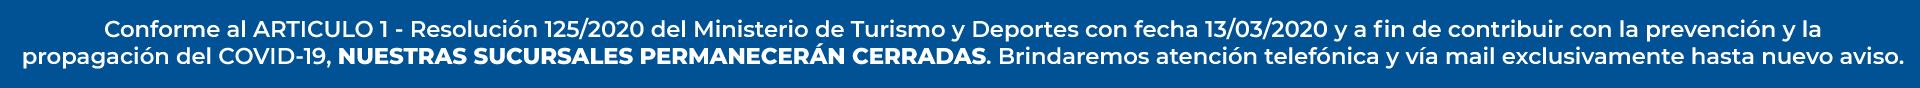 banner-info-oficina